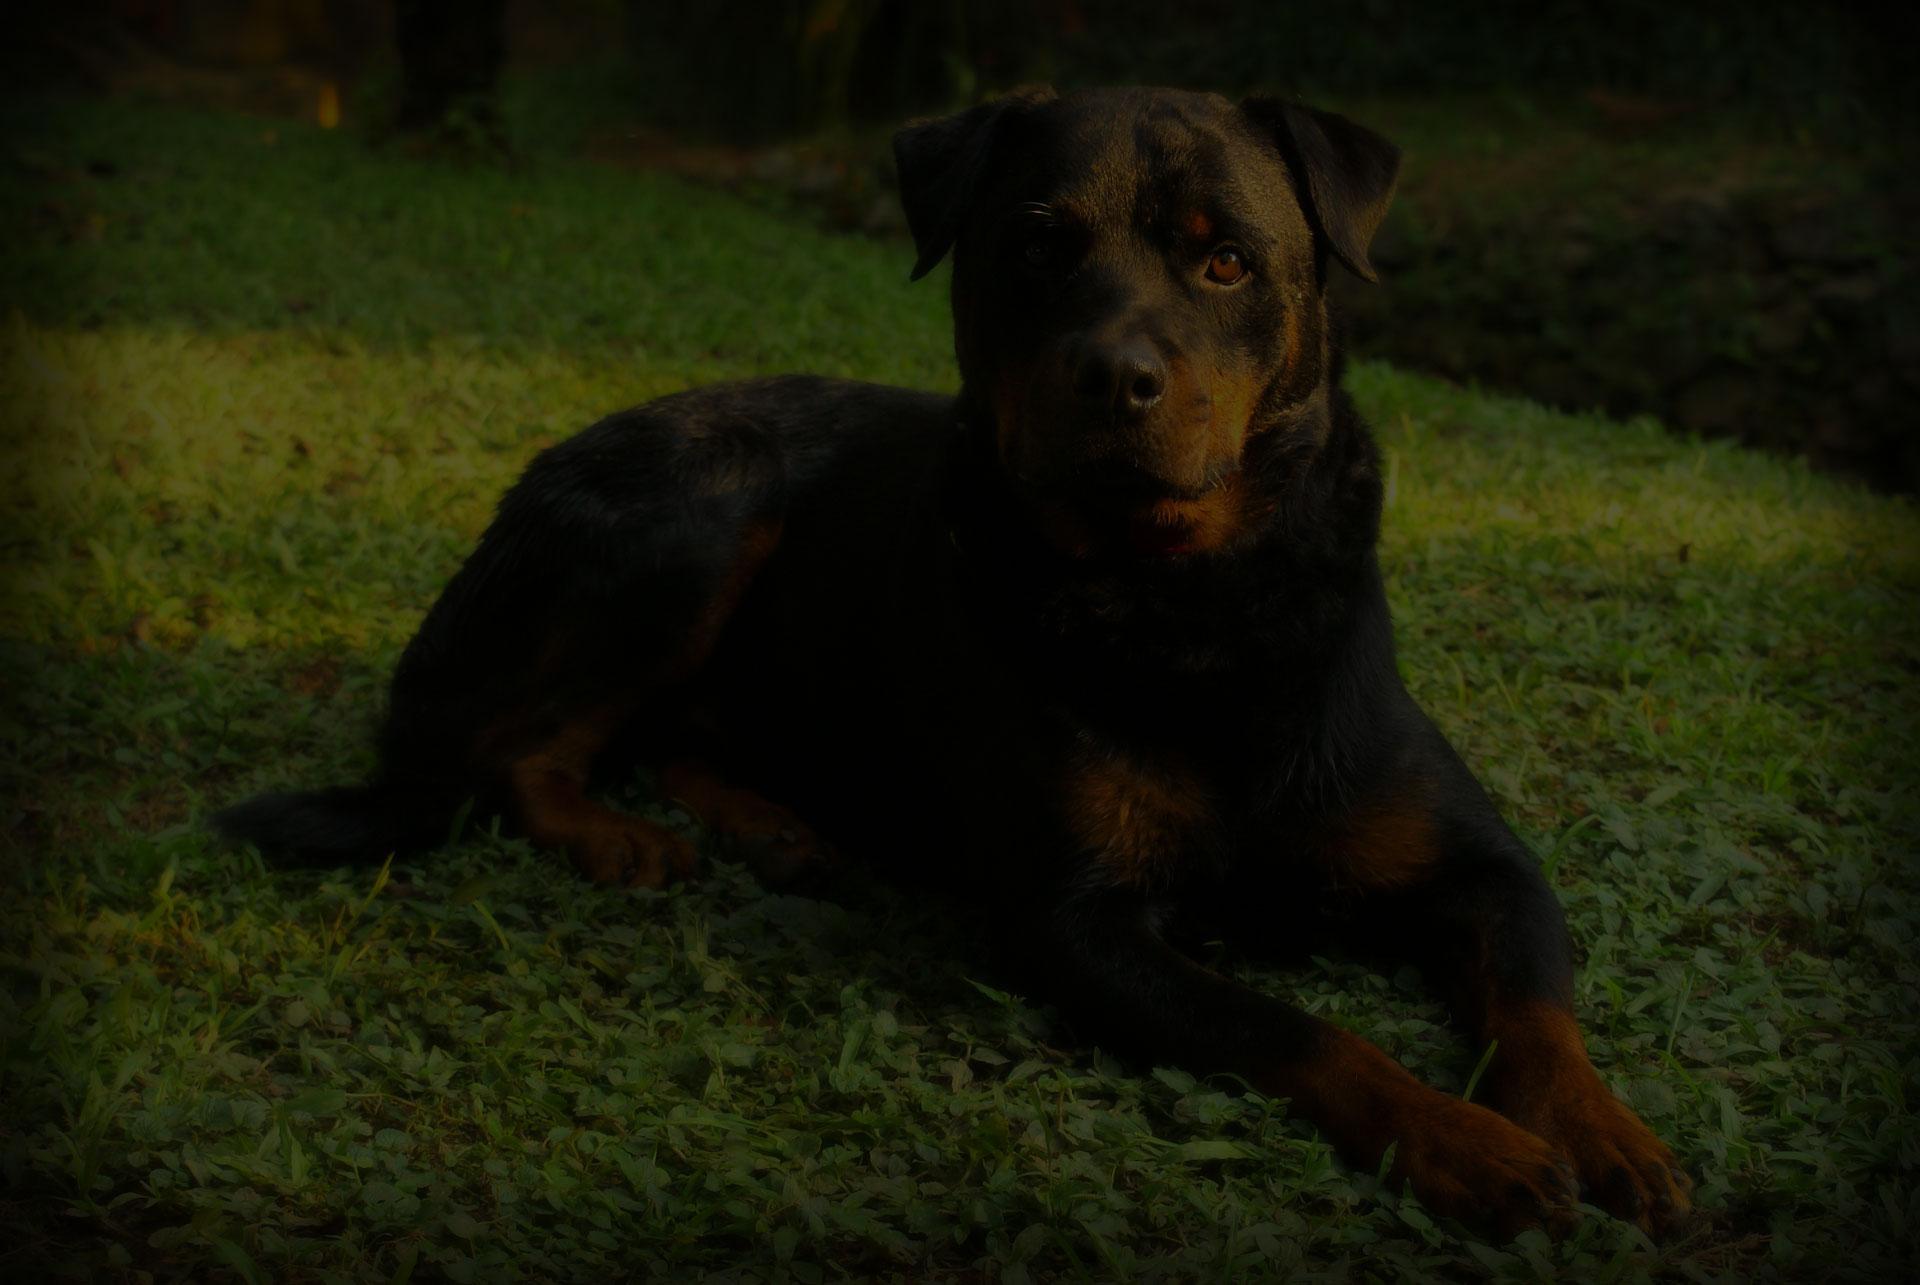 rottweiler-dog-nature